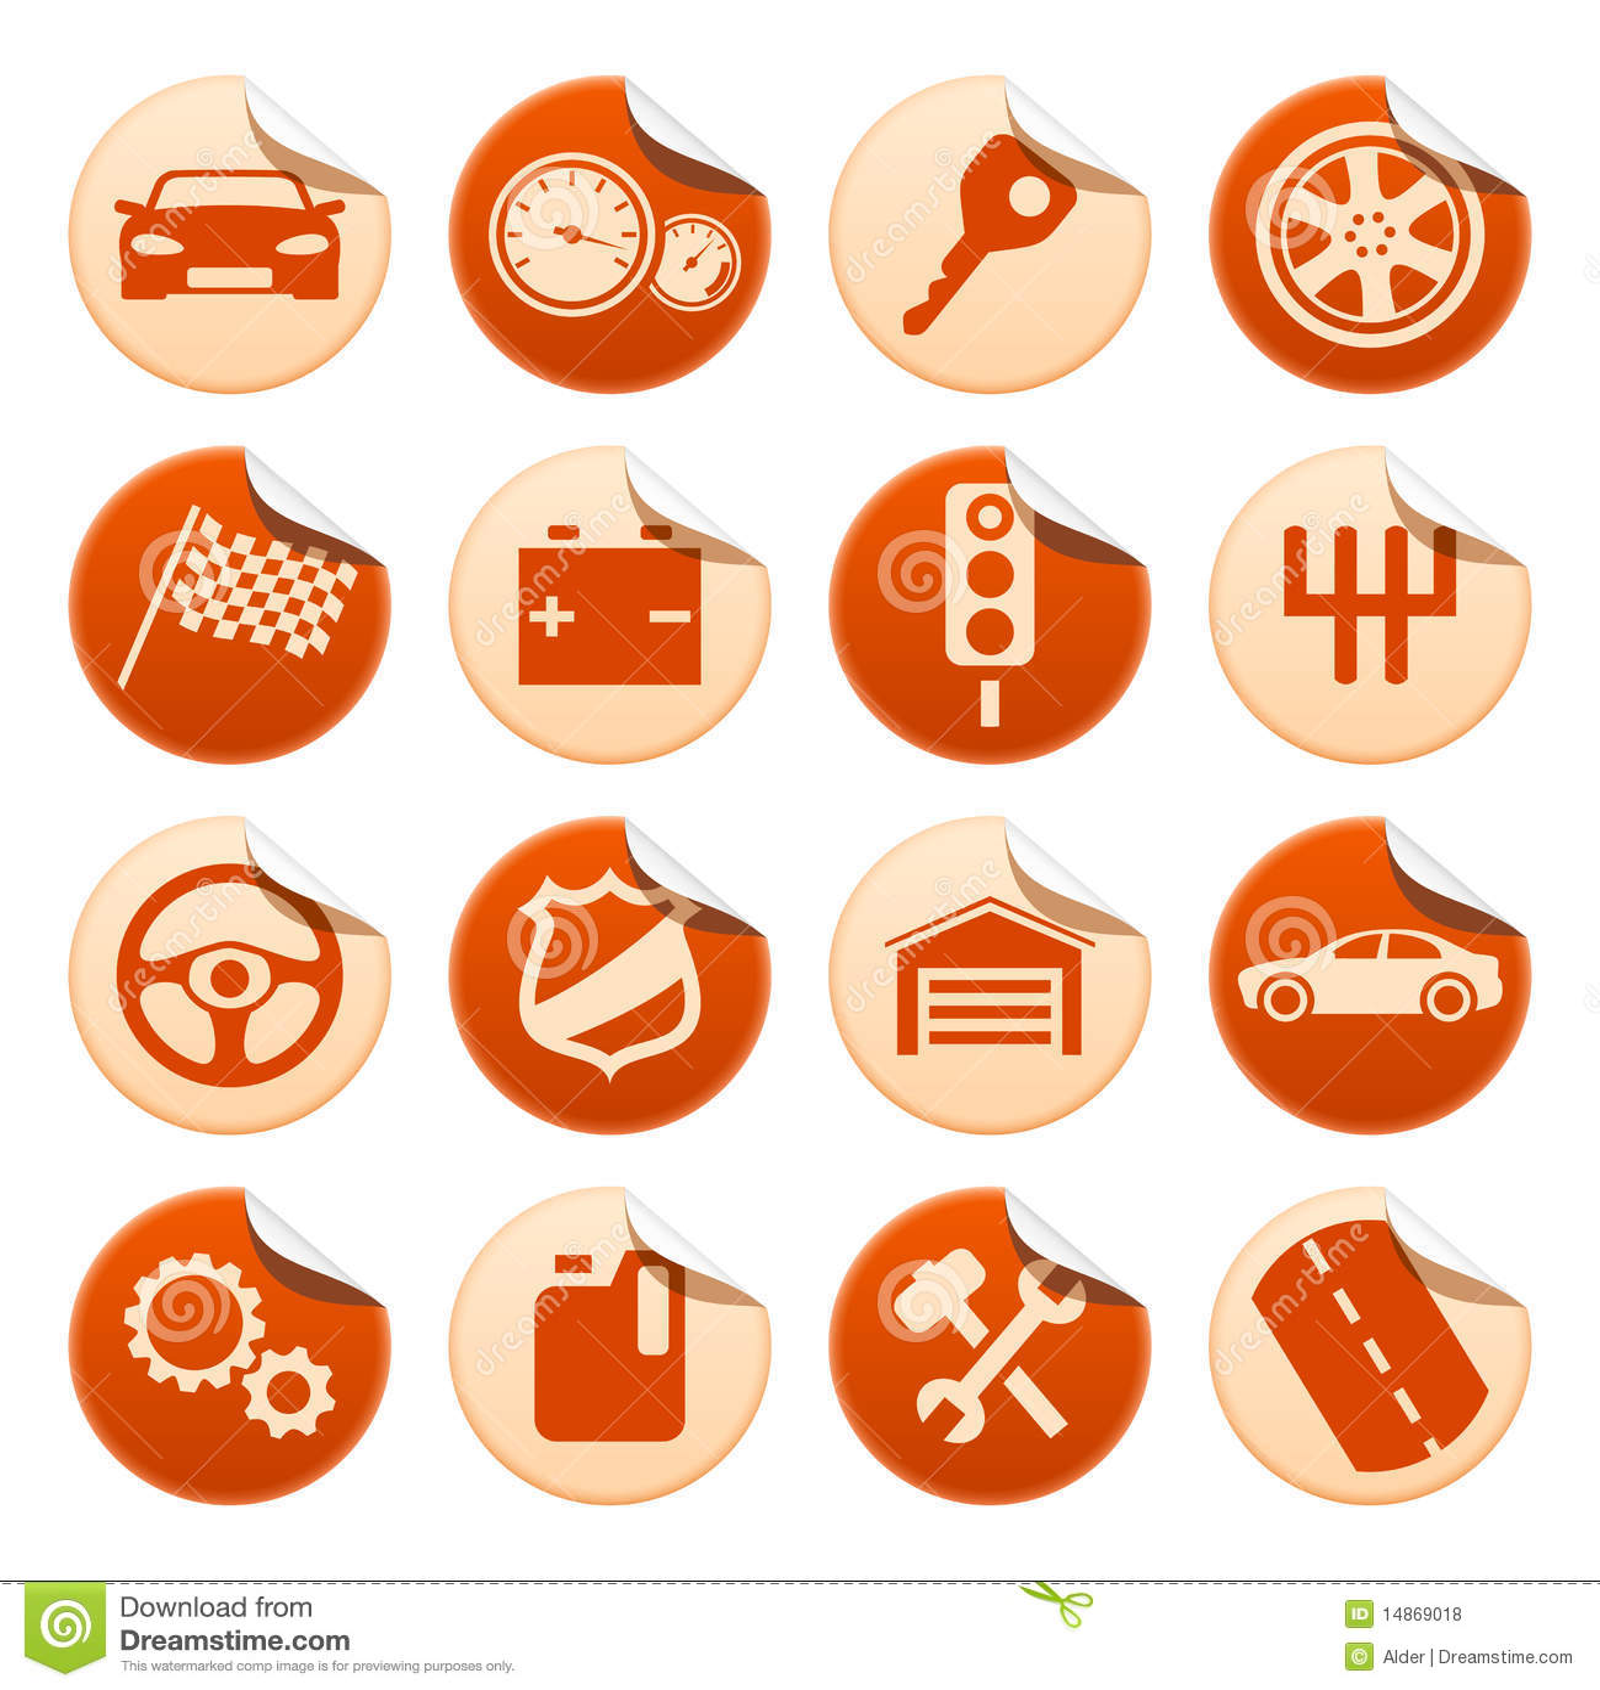 Car sticker design download - Car Stickers